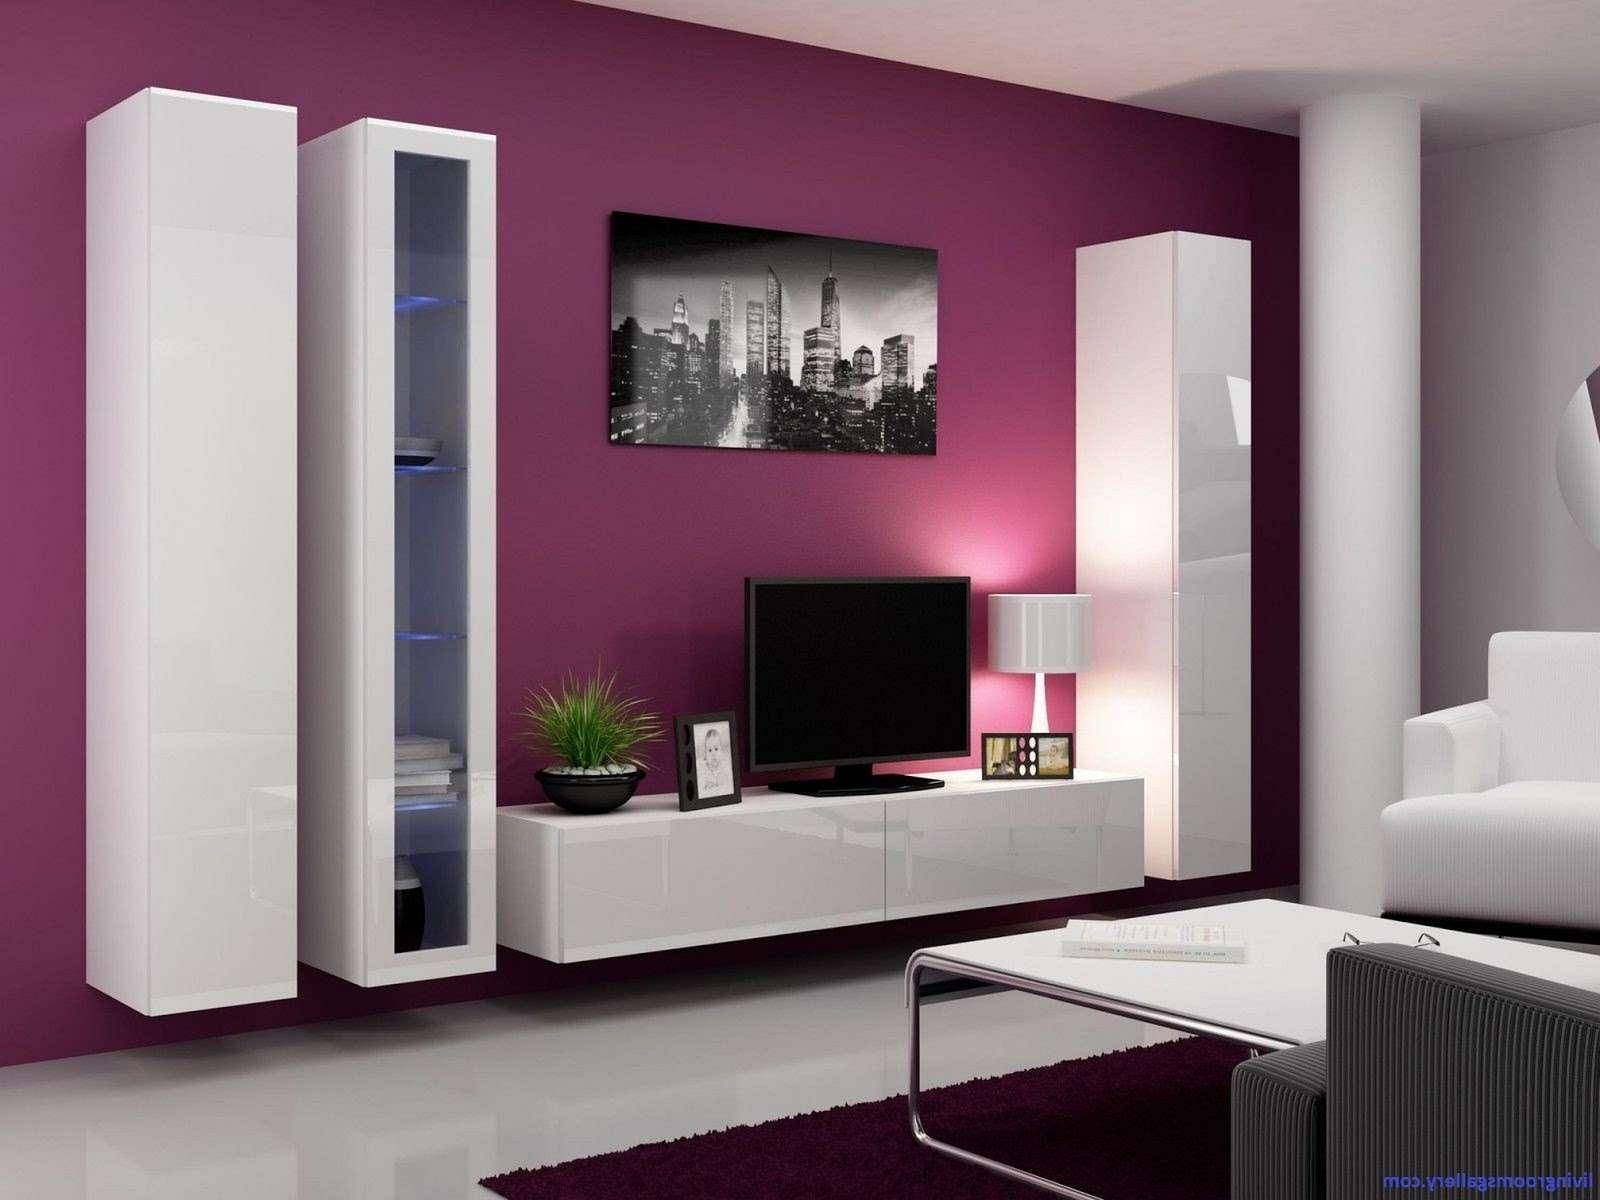 Modern Cupboard Designs Throughout Modern Tv Cabinets Designs (View 15 of 20)